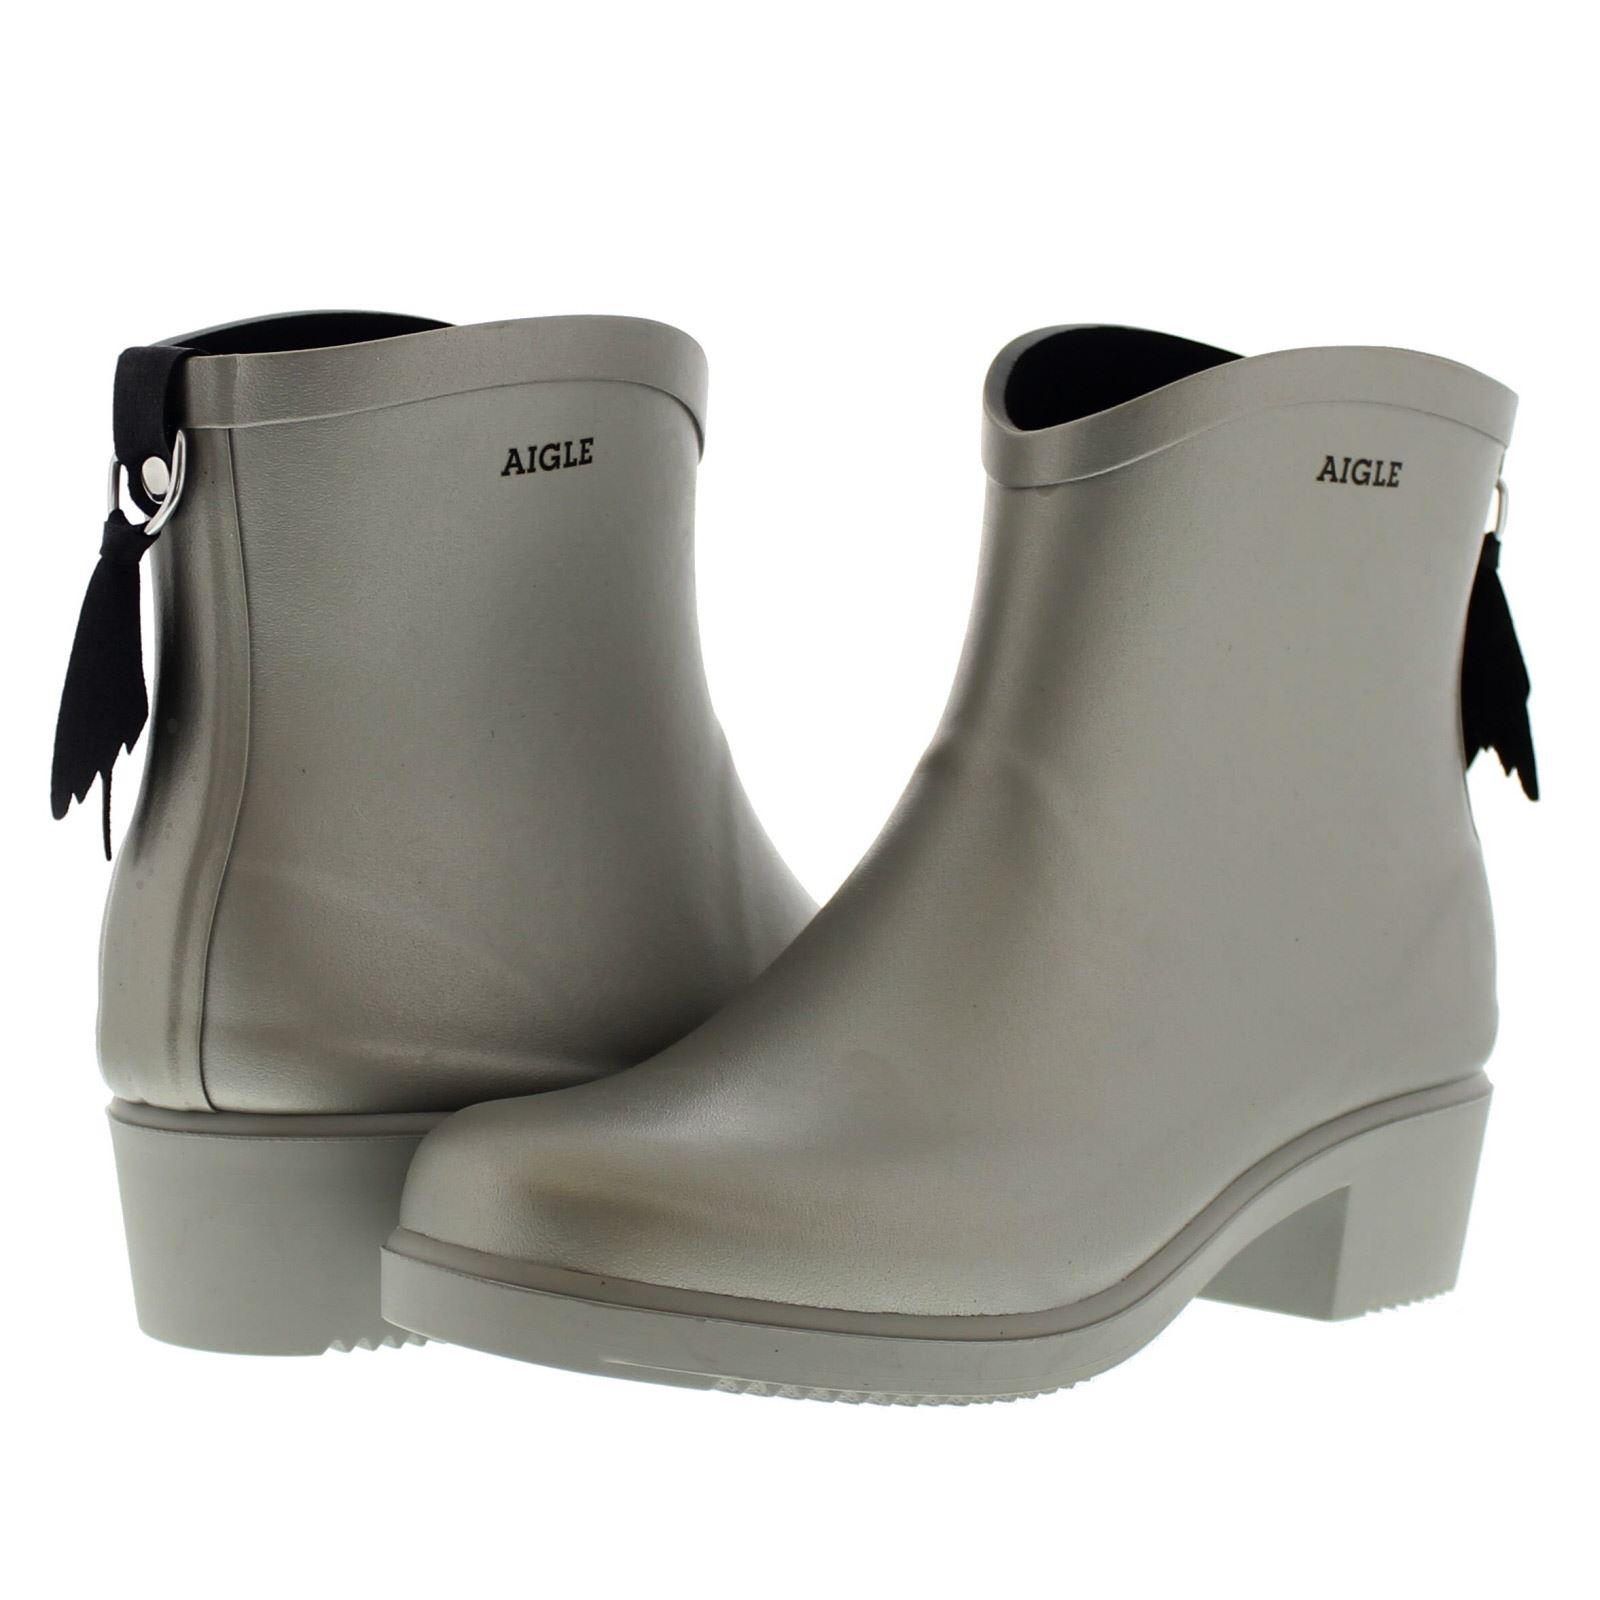 aigle miss juliette bottillon silver womens boots ebay. Black Bedroom Furniture Sets. Home Design Ideas